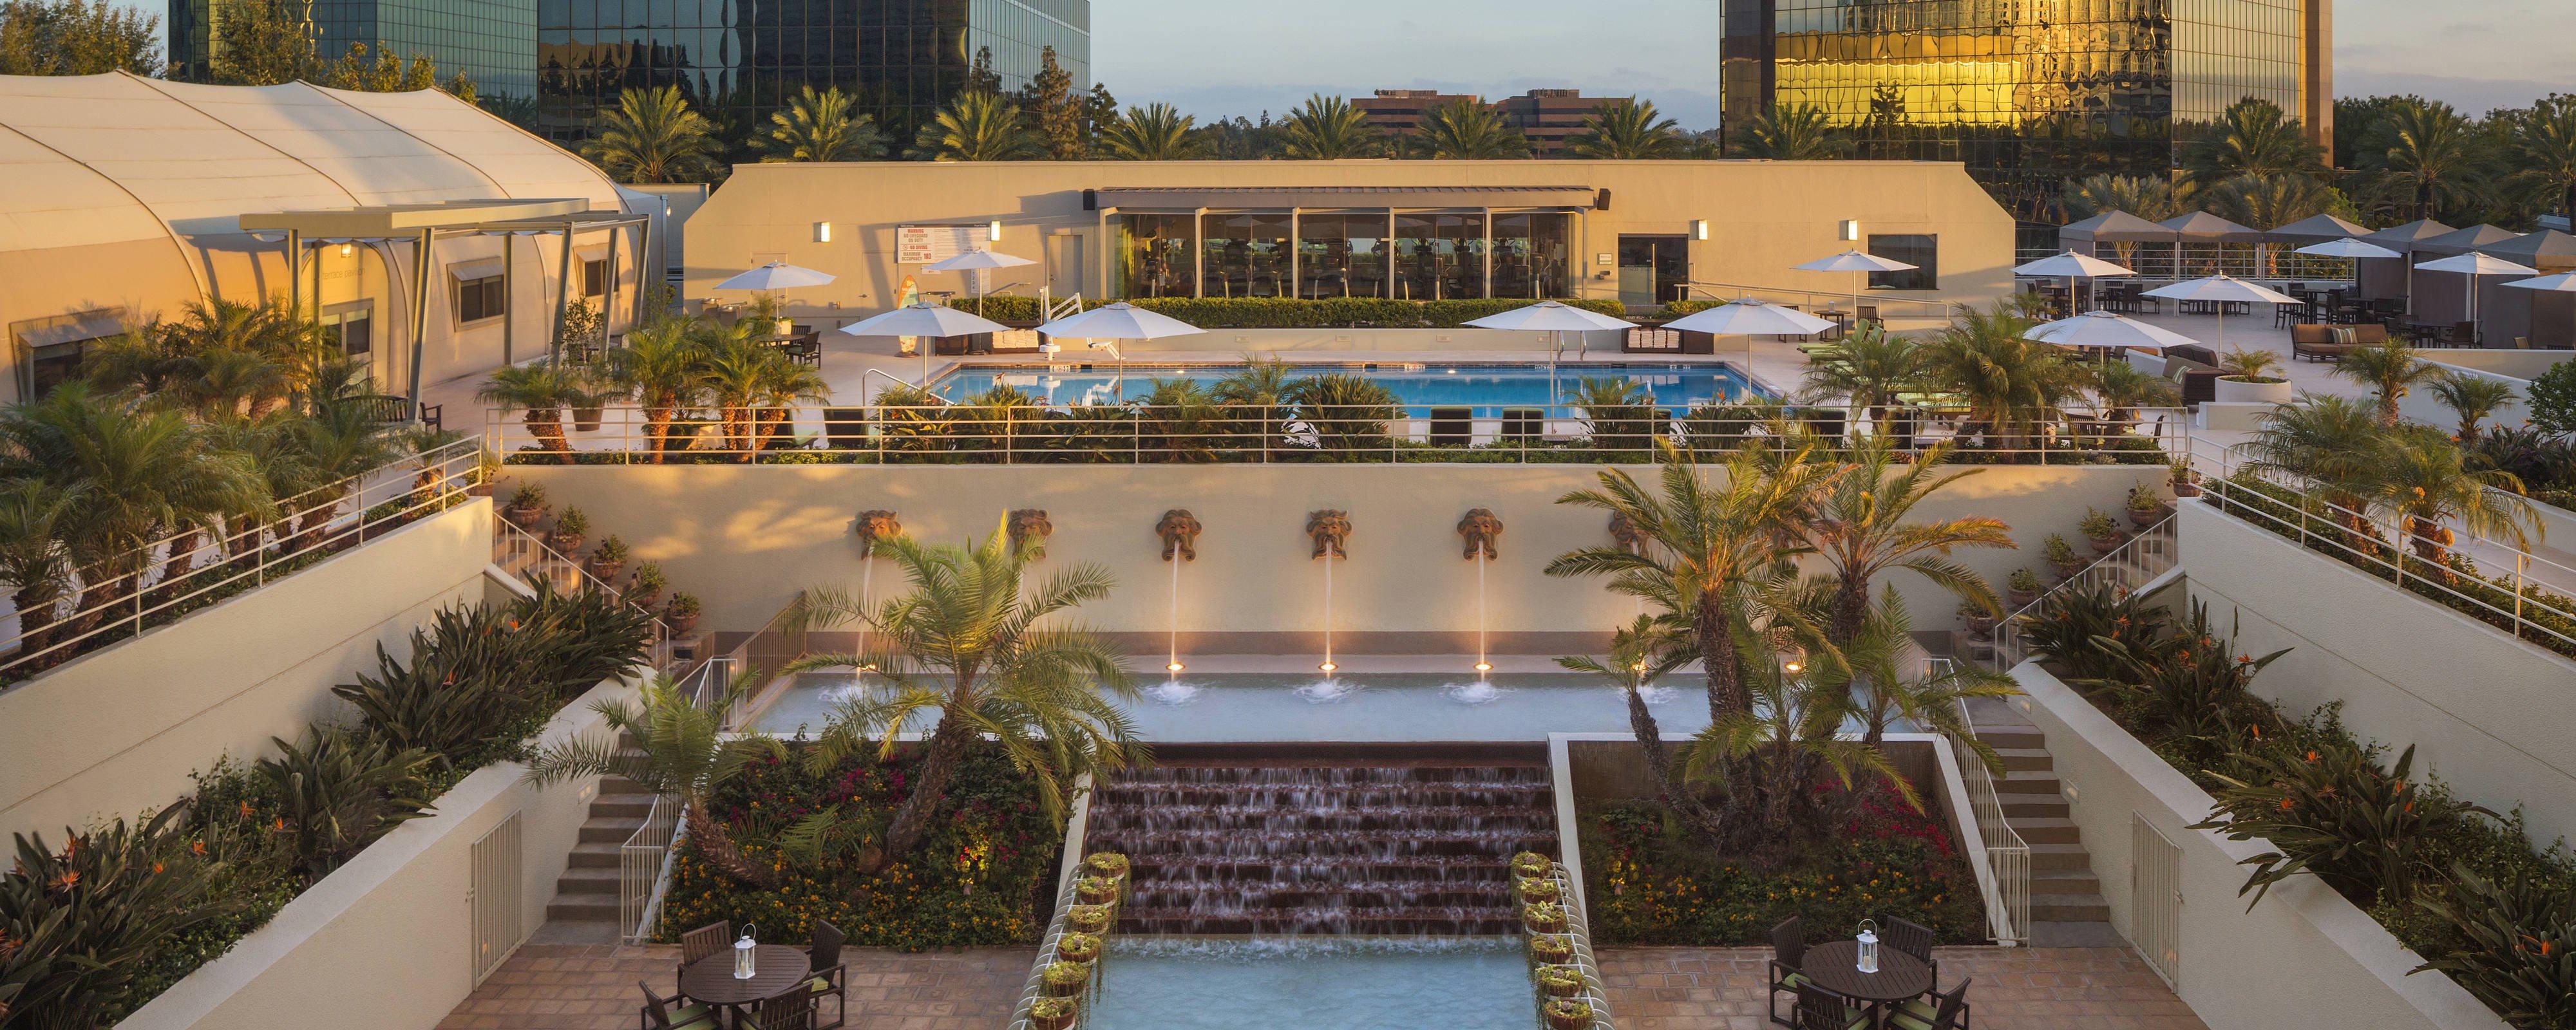 Orange County Hotel - Costa Mesa | The Westin South Coast Plaza - Spg Hotels California Map